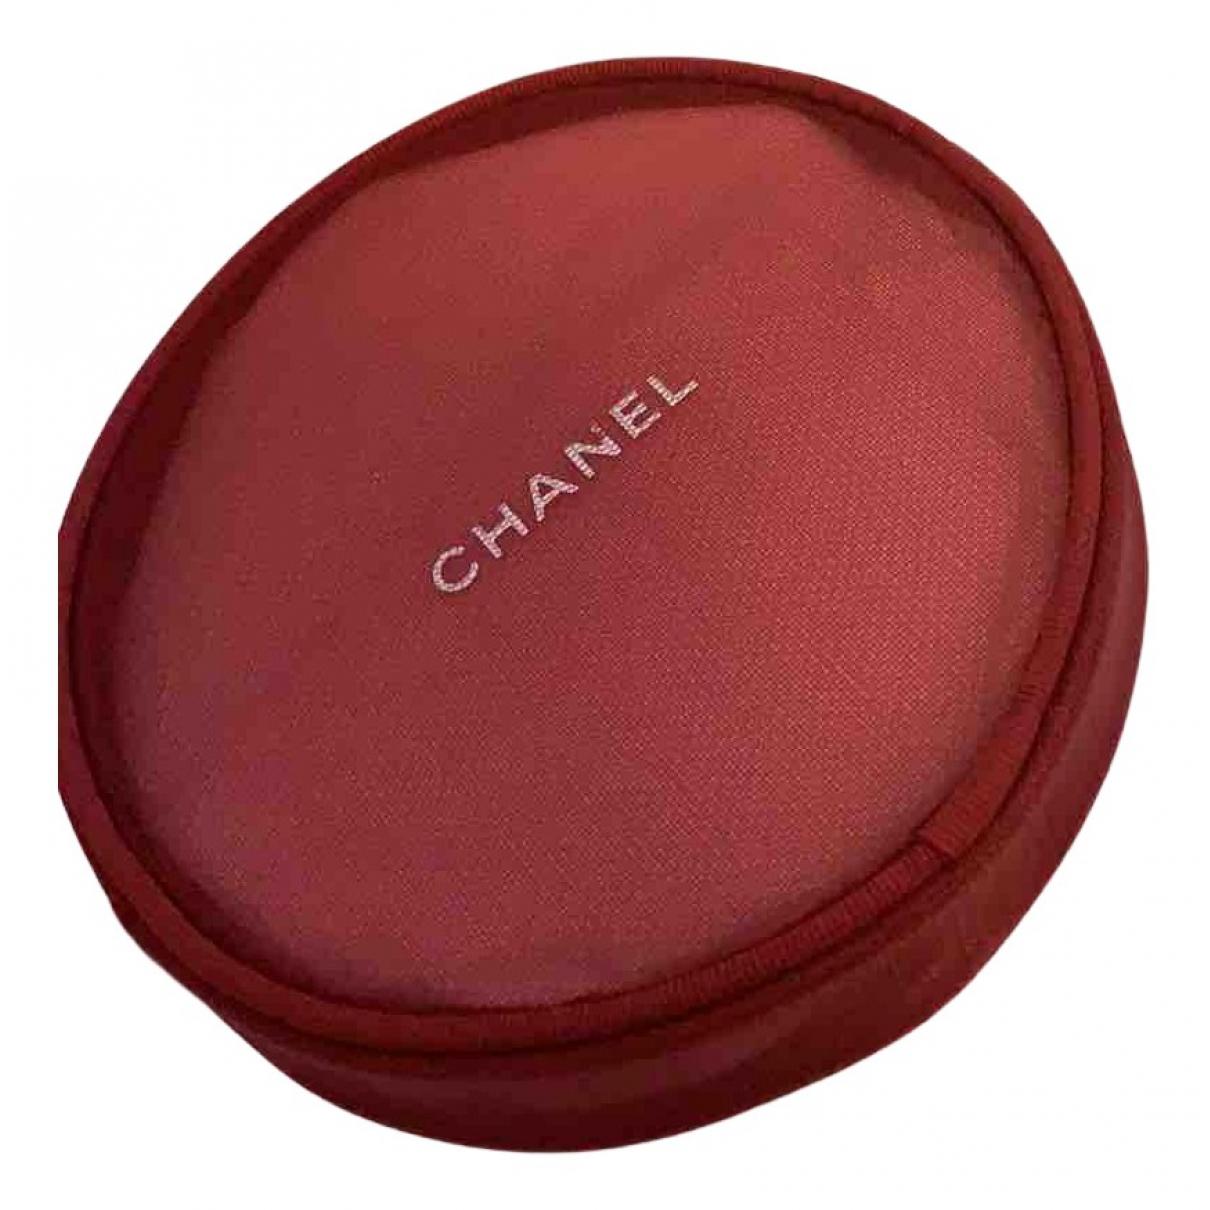 Chanel \N Kleinlederwaren in  Rot Synthetik